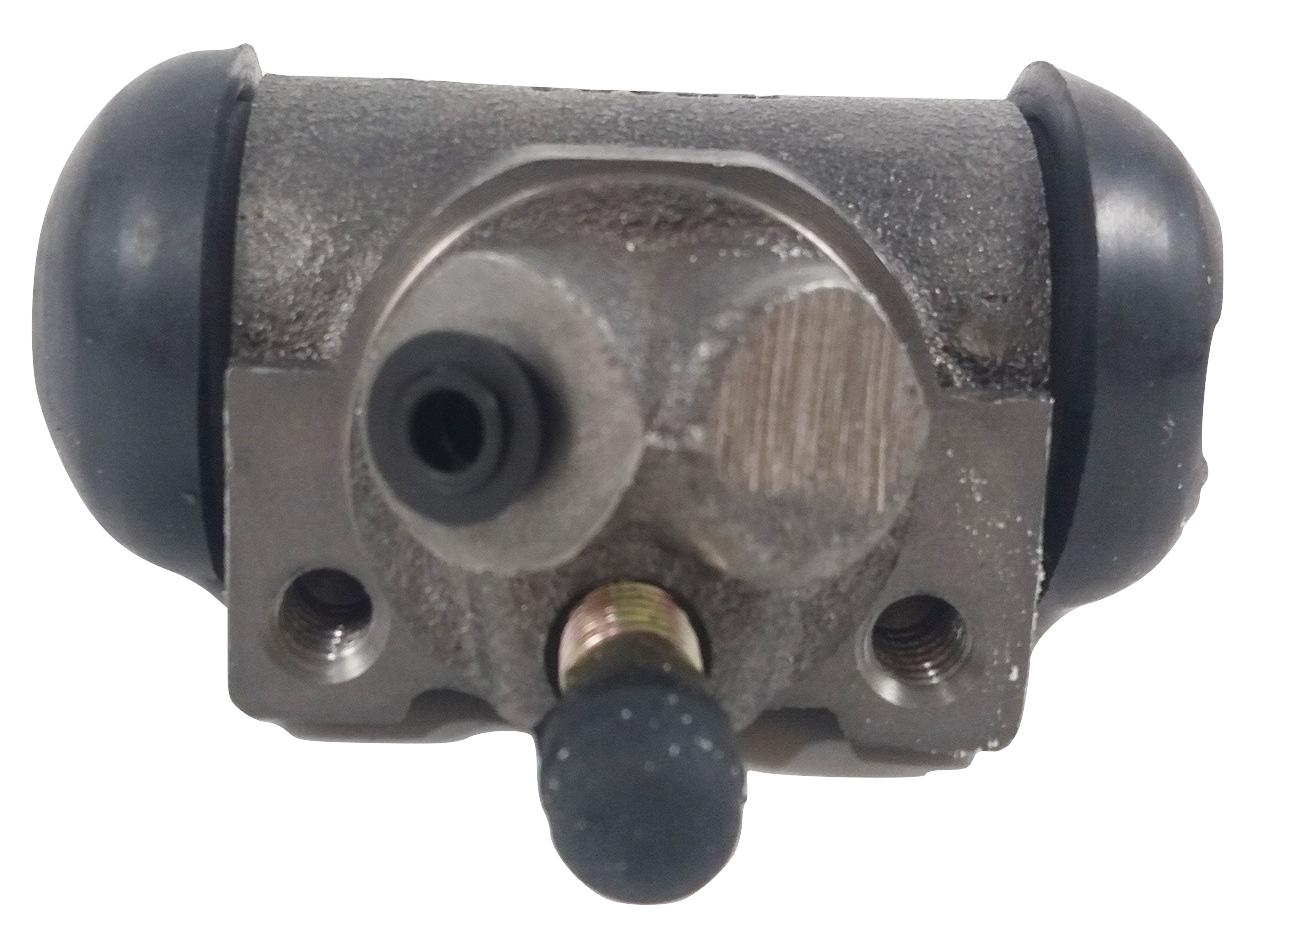 Cilindro de Roda A10 / A15 / A16 / A20 / C10 / C14 / C15 / C16 / C20 / Veraneio / F-75 / Aero  / Itamaraty - Traseiro Direito -  CR-92151